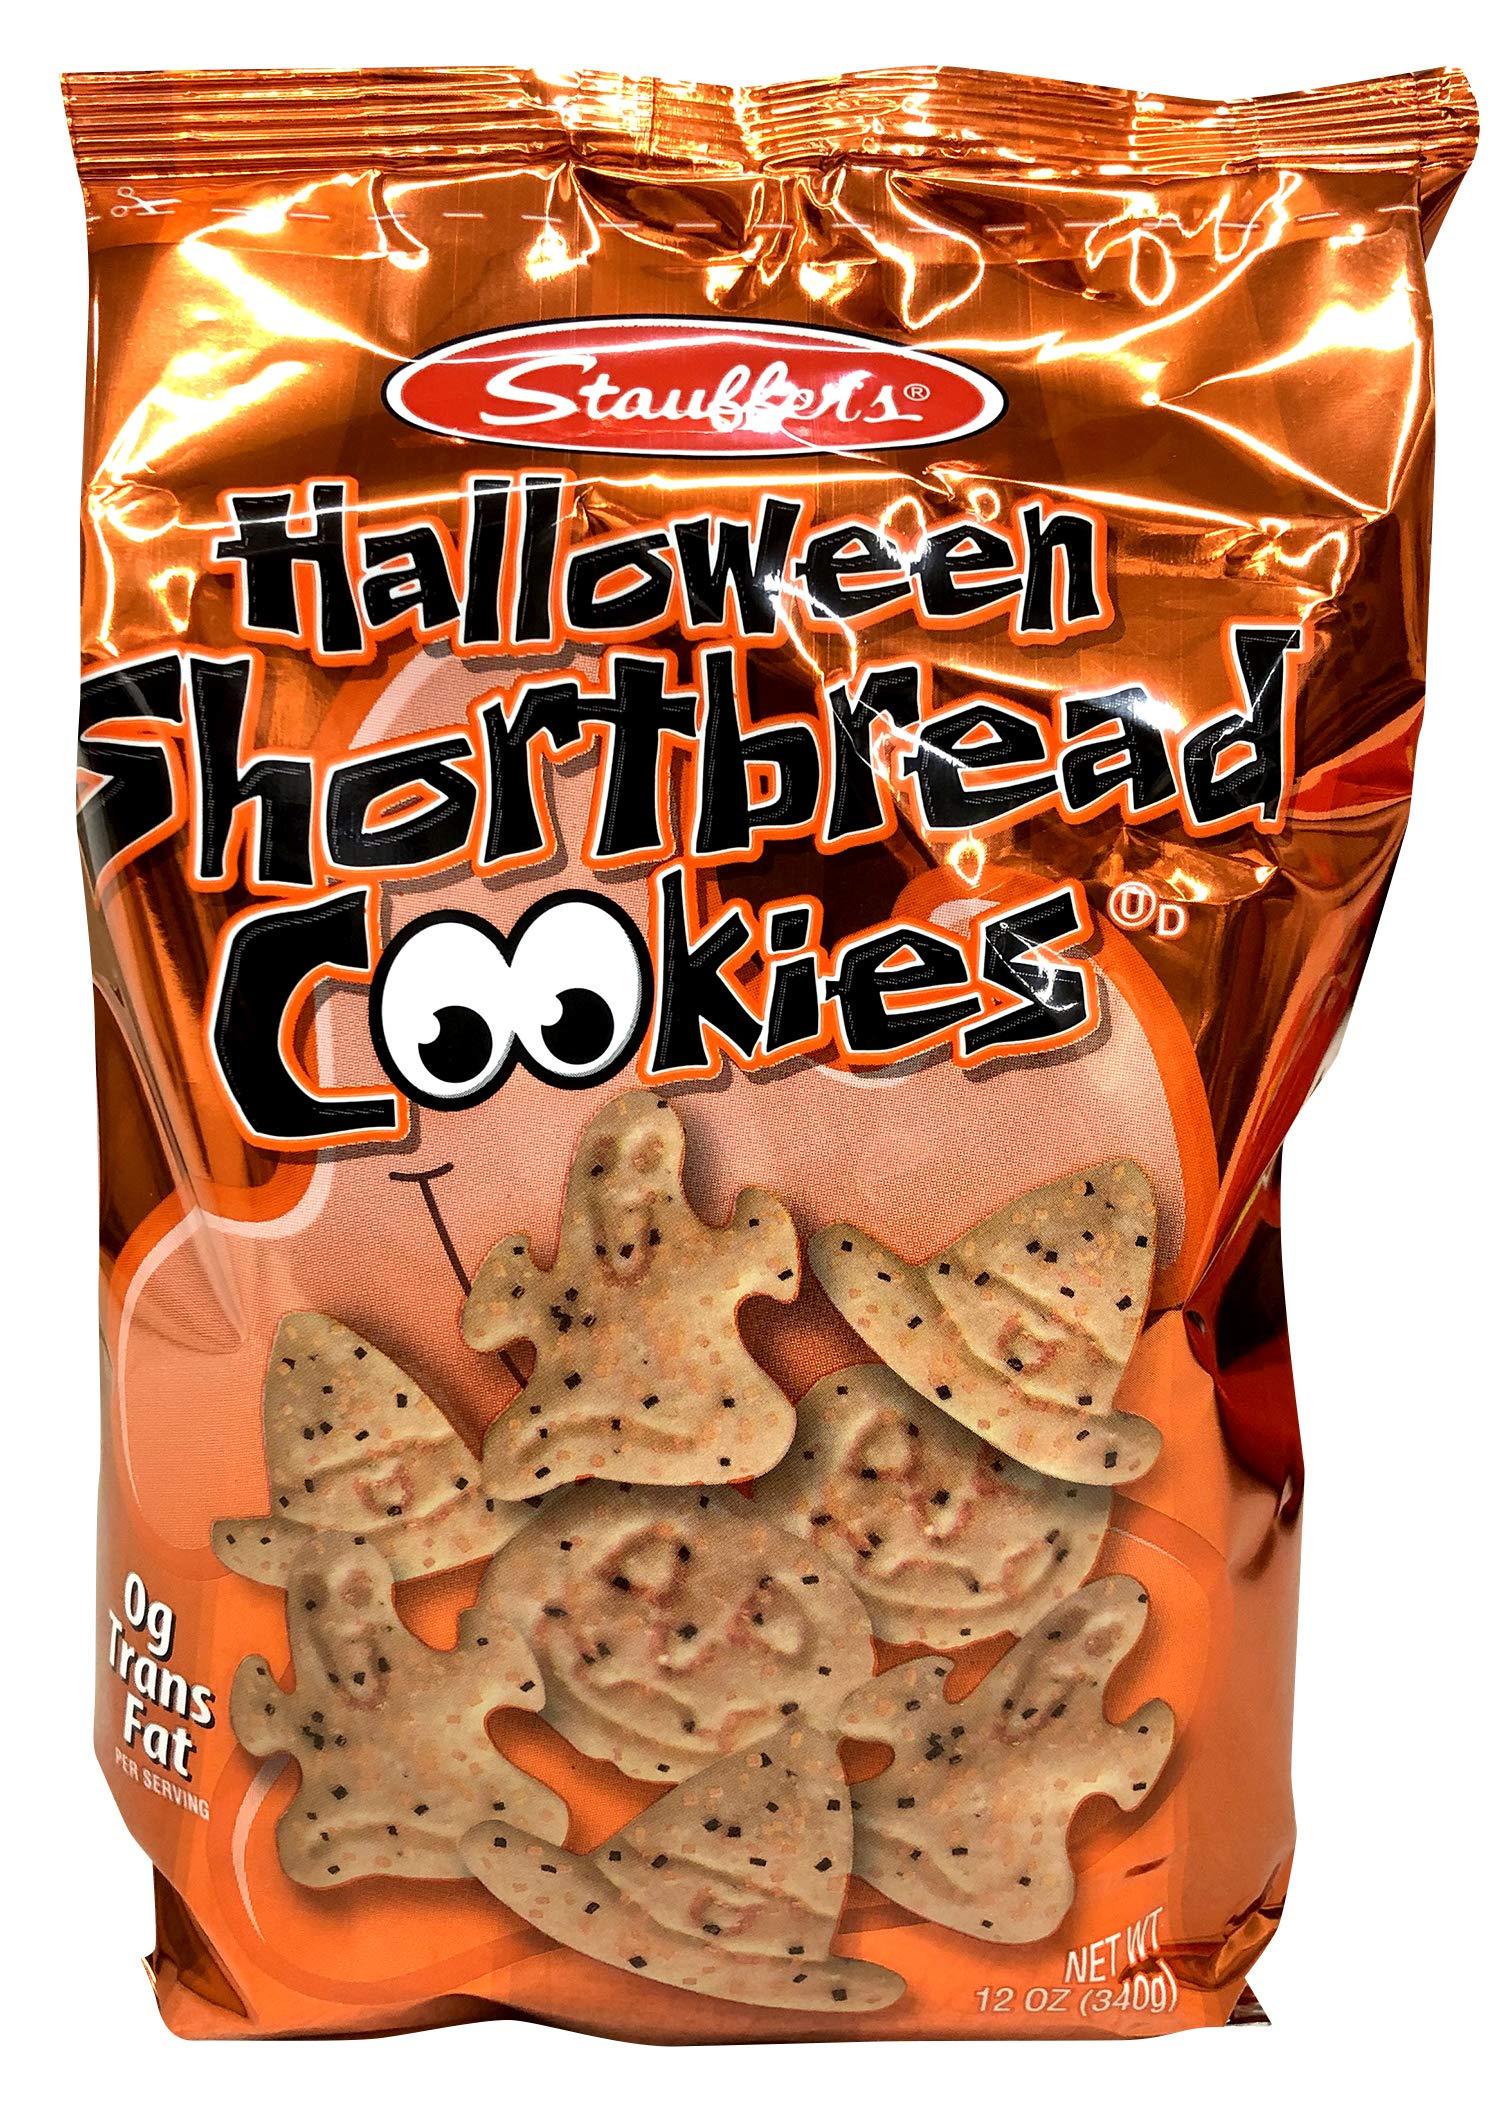 Stauffer's Halloween Shortbread Cookies, 12oz. Bags (Set of 2) by Stauffer's